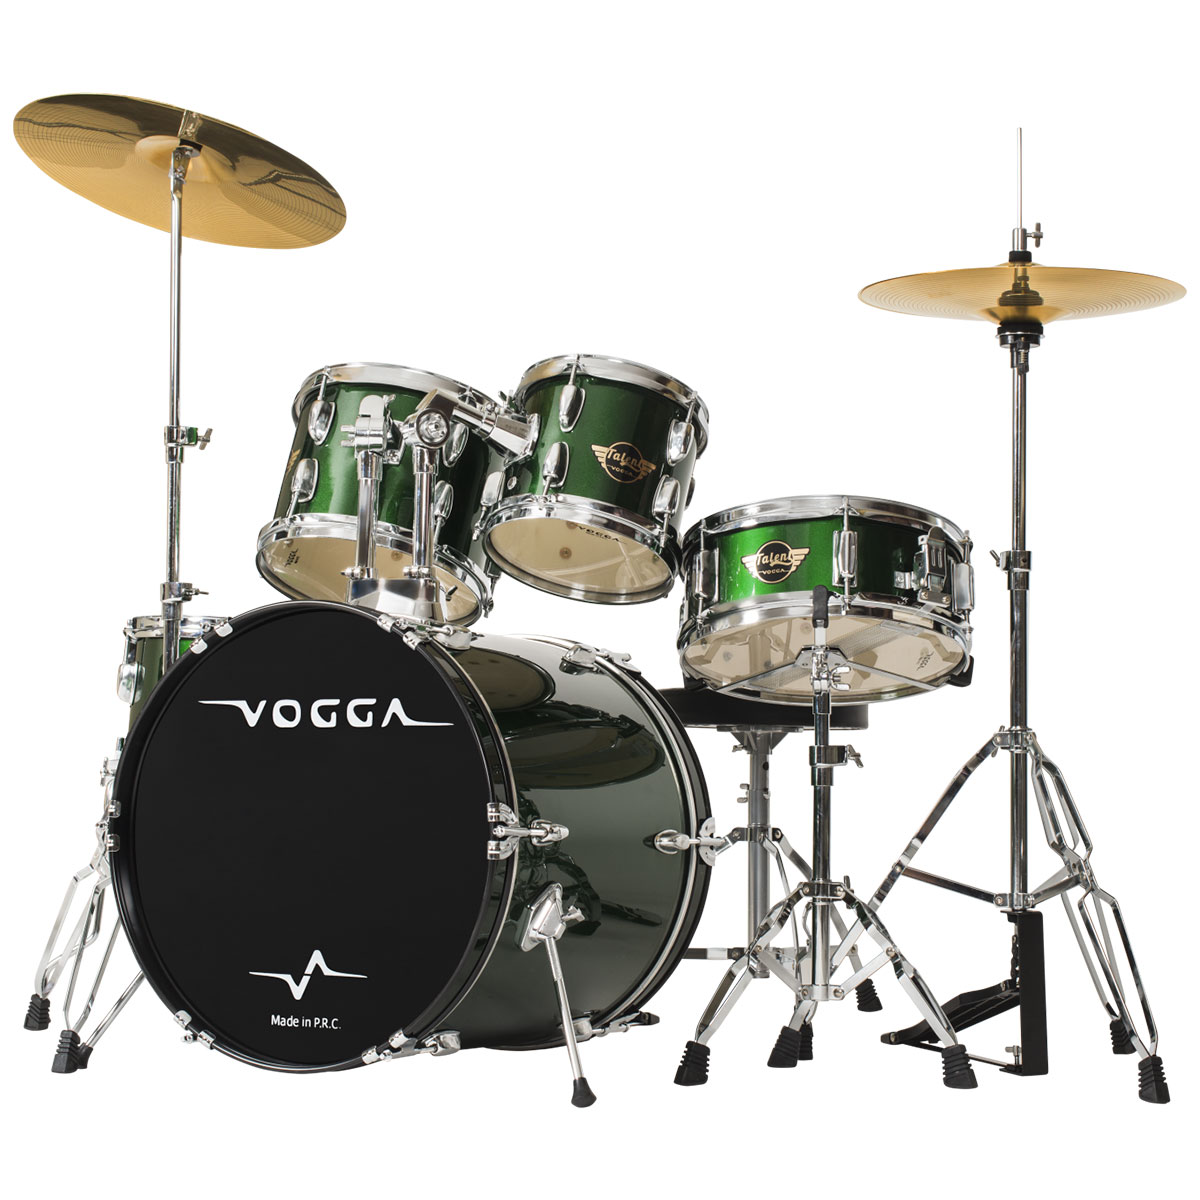 Bateria Acústica Bumbo 22 Polegadas Talent VPD924 Verde - Vogga